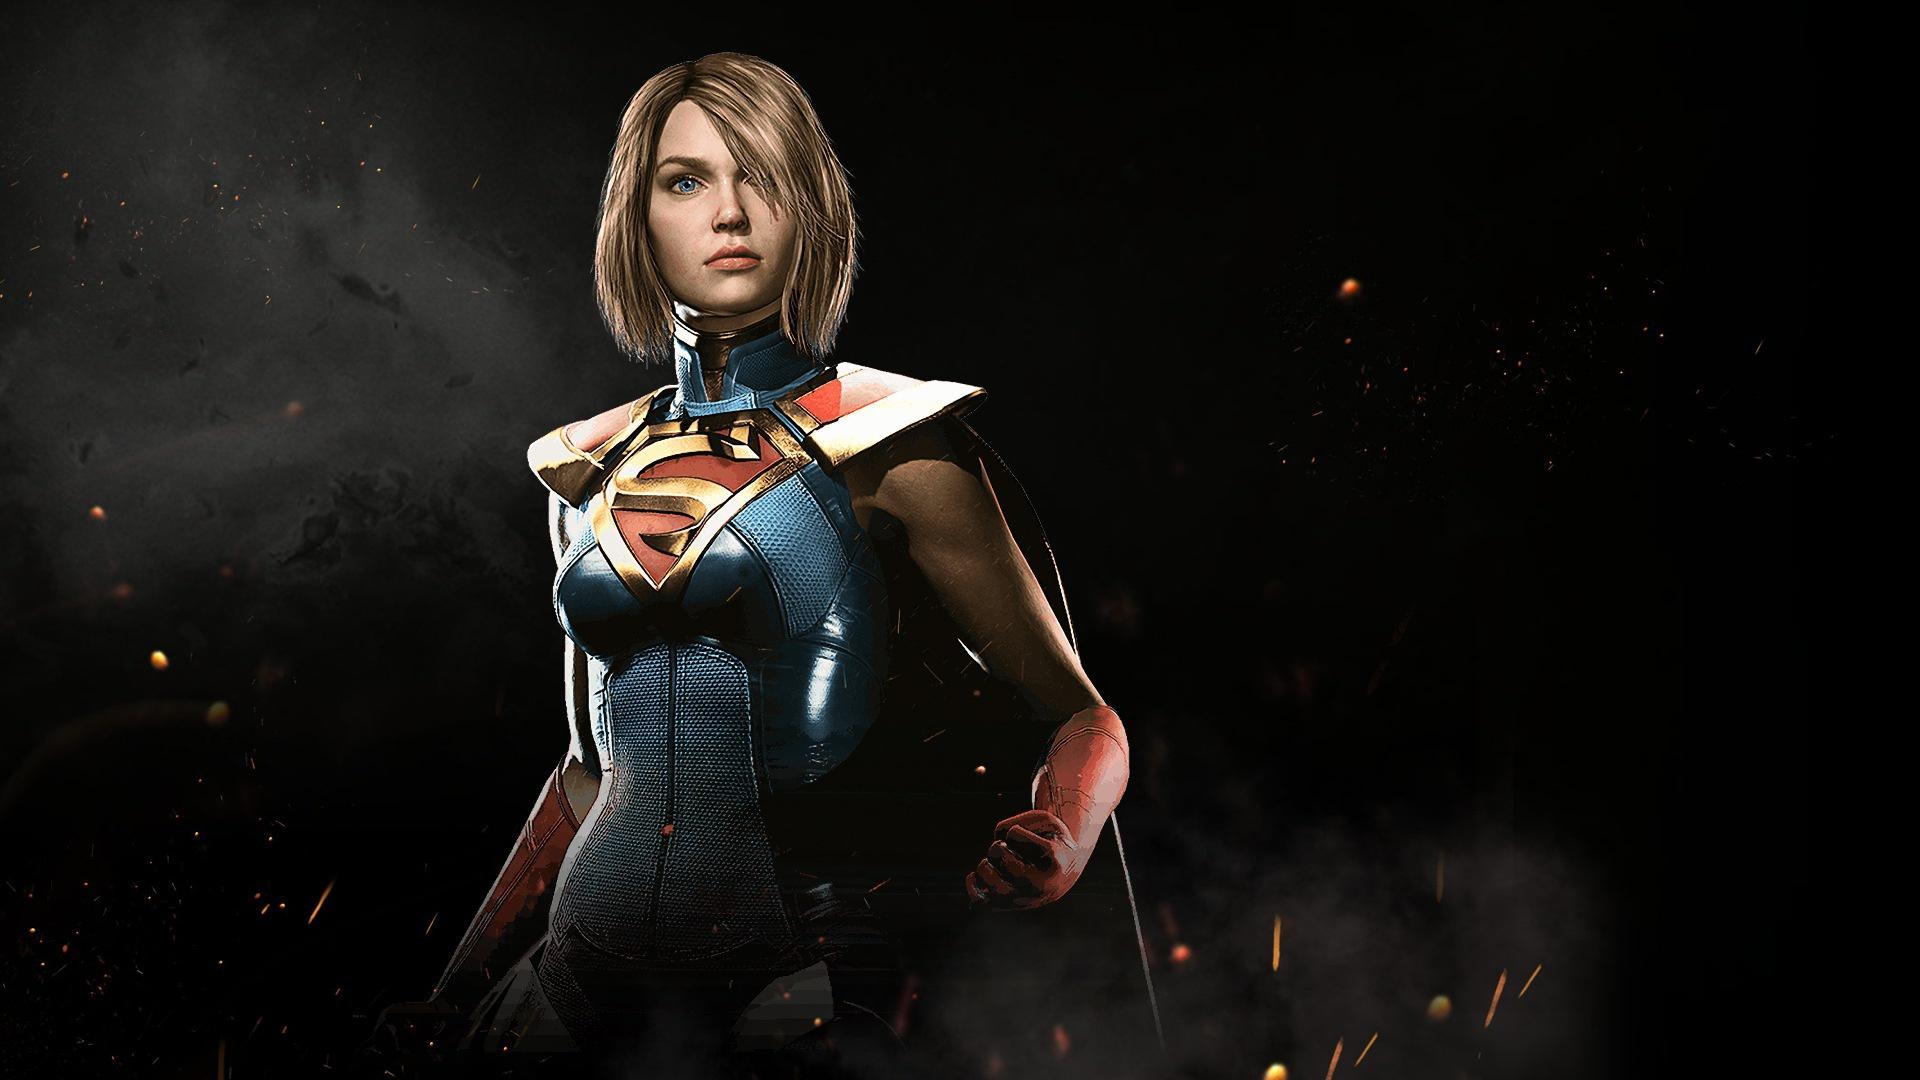 Supergirl in injustice 2. обои скачать